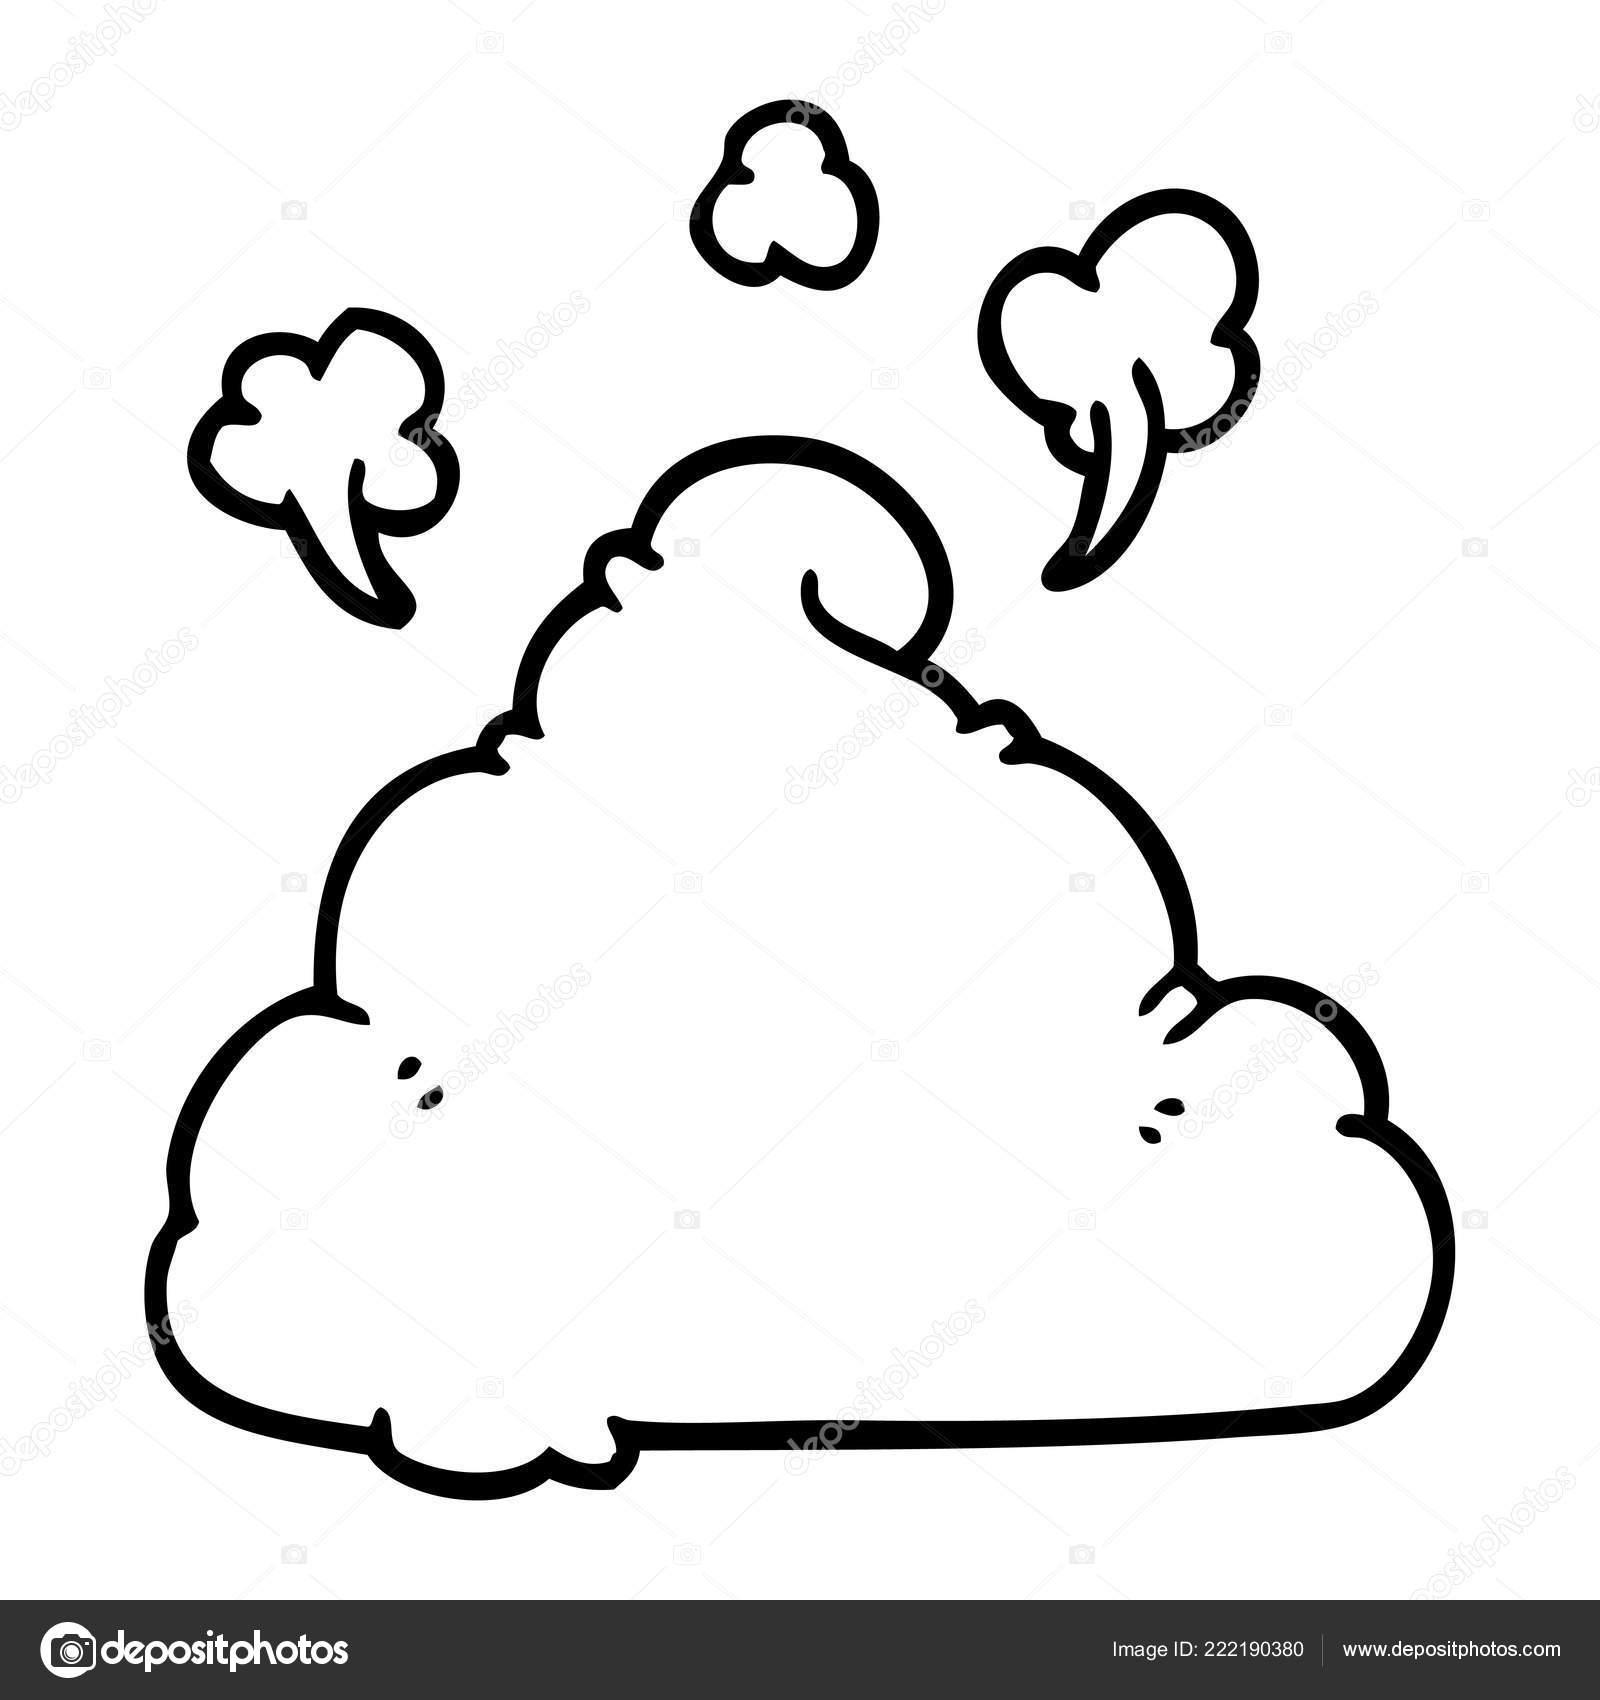 Dessin Ligne Caca Dessin Anime Image Vectorielle Lineartestpilot C 222190380